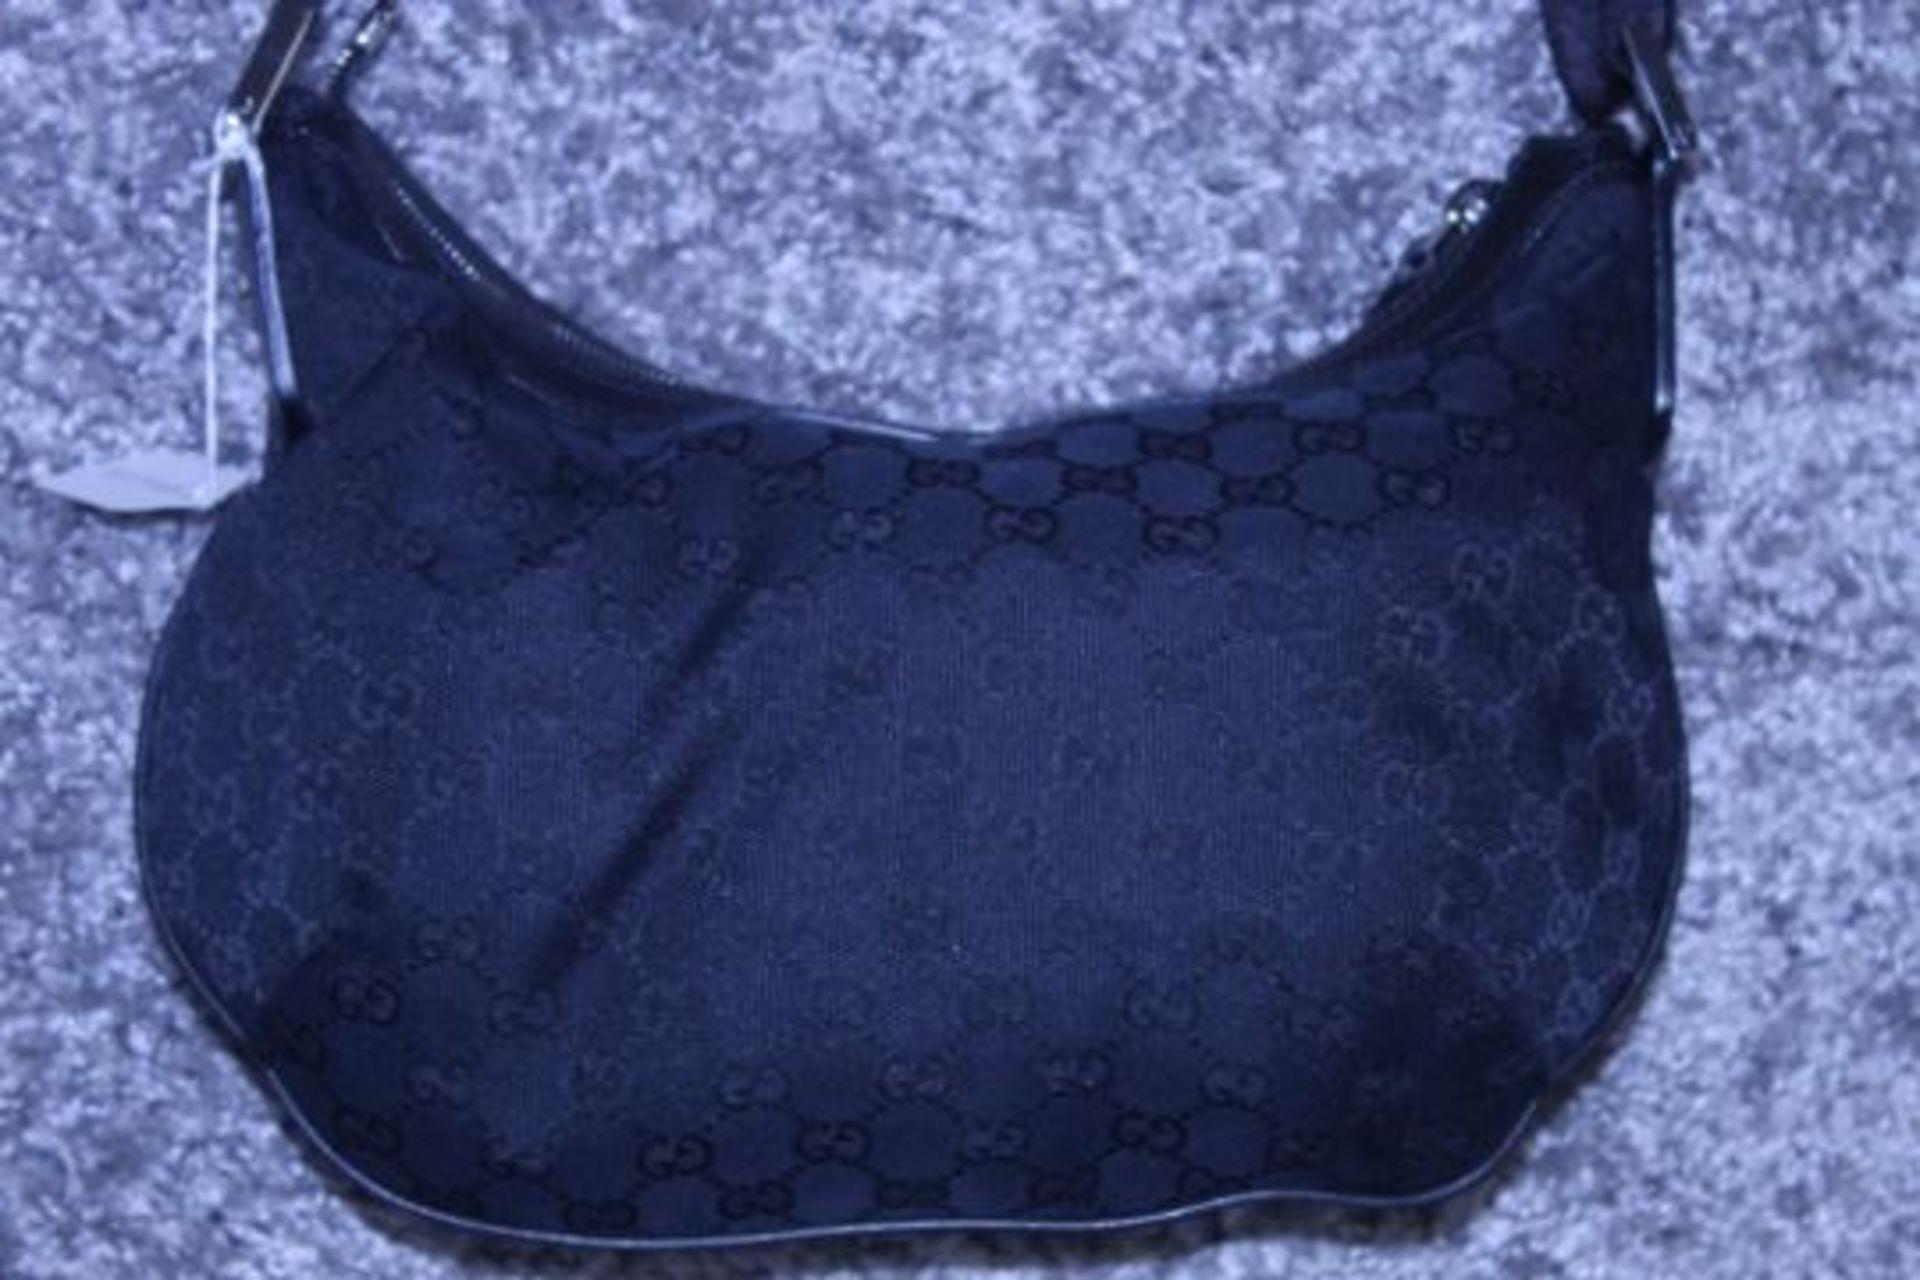 RRP £1,080 Gucci Messenger Shoulder Bag, Black Mongrame Canvas, 32X24X2Cm (Production Code 181092- - Image 2 of 2